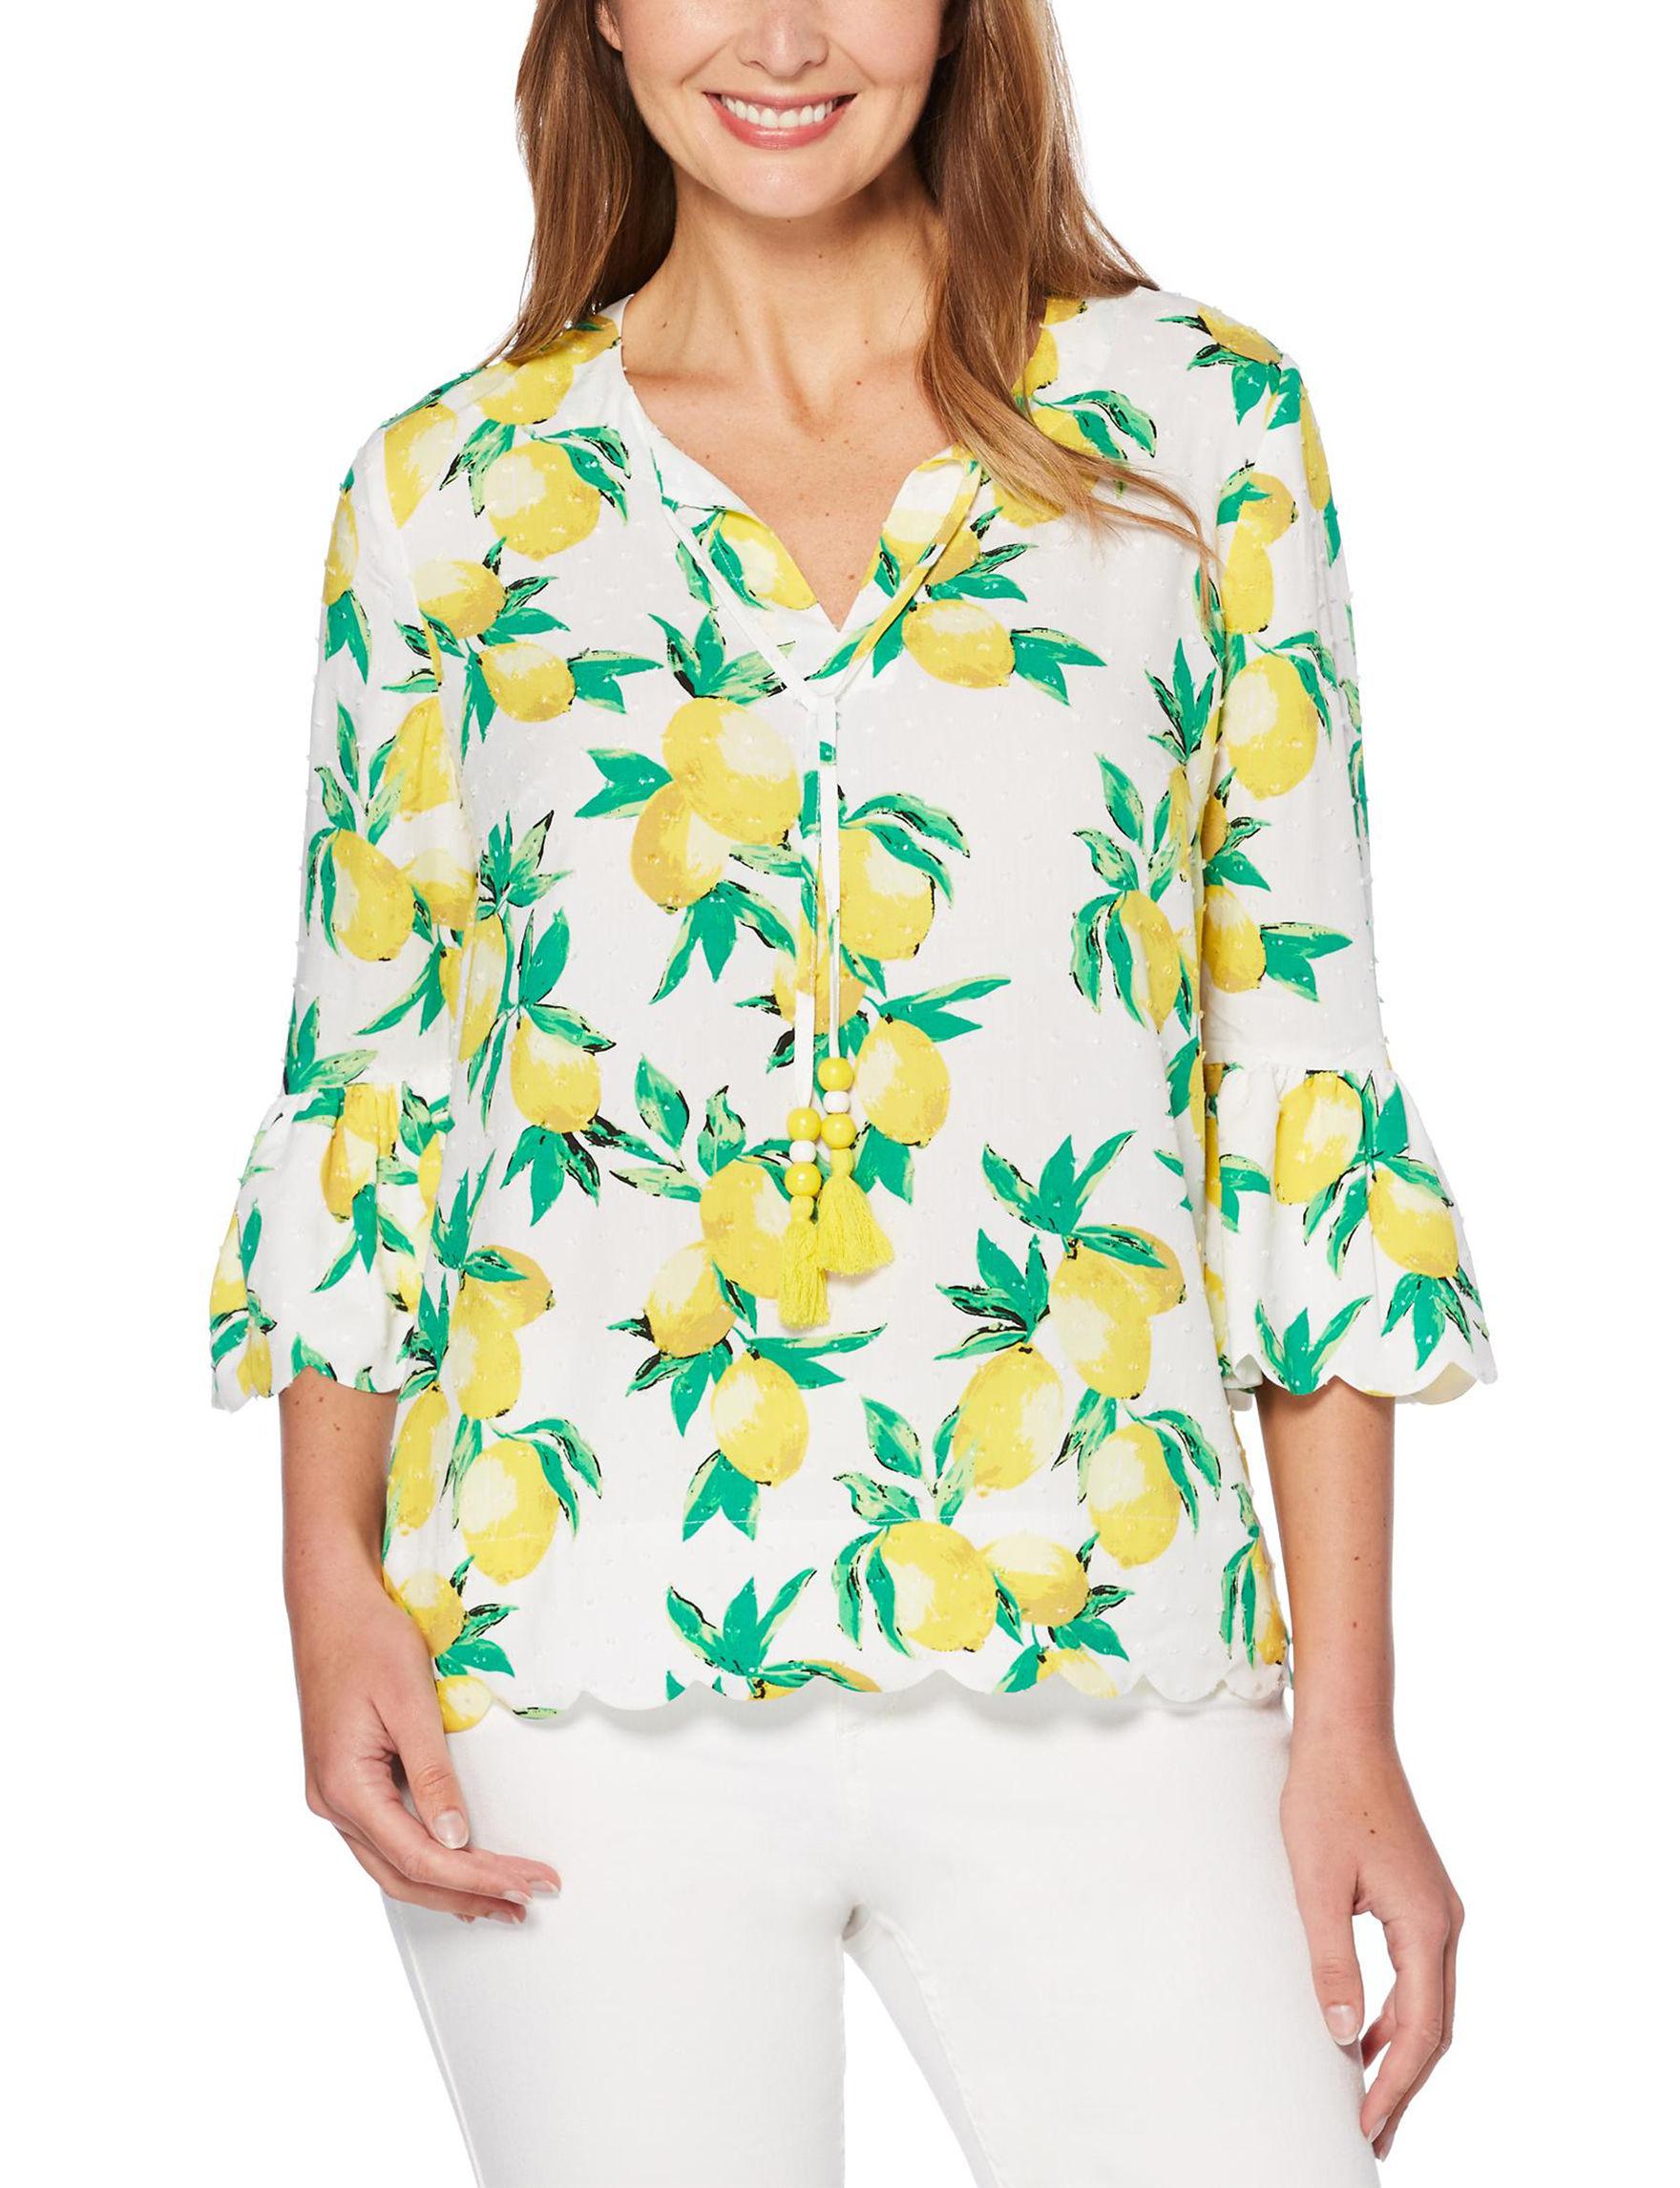 Rafaella White Shirts & Blouses